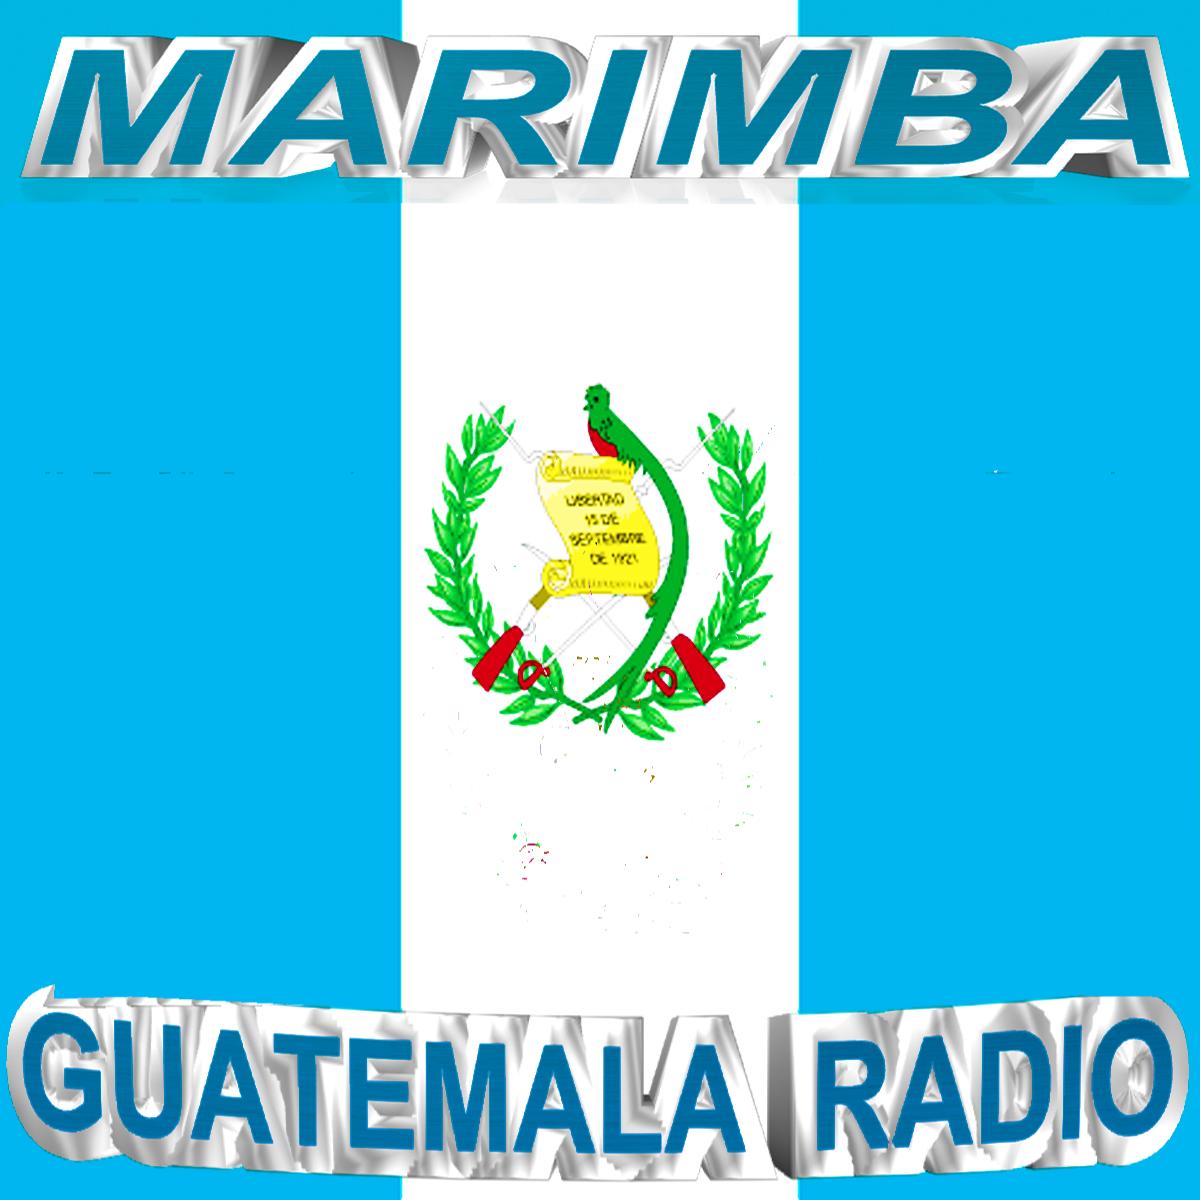 Marimba de Guatemala Radiio